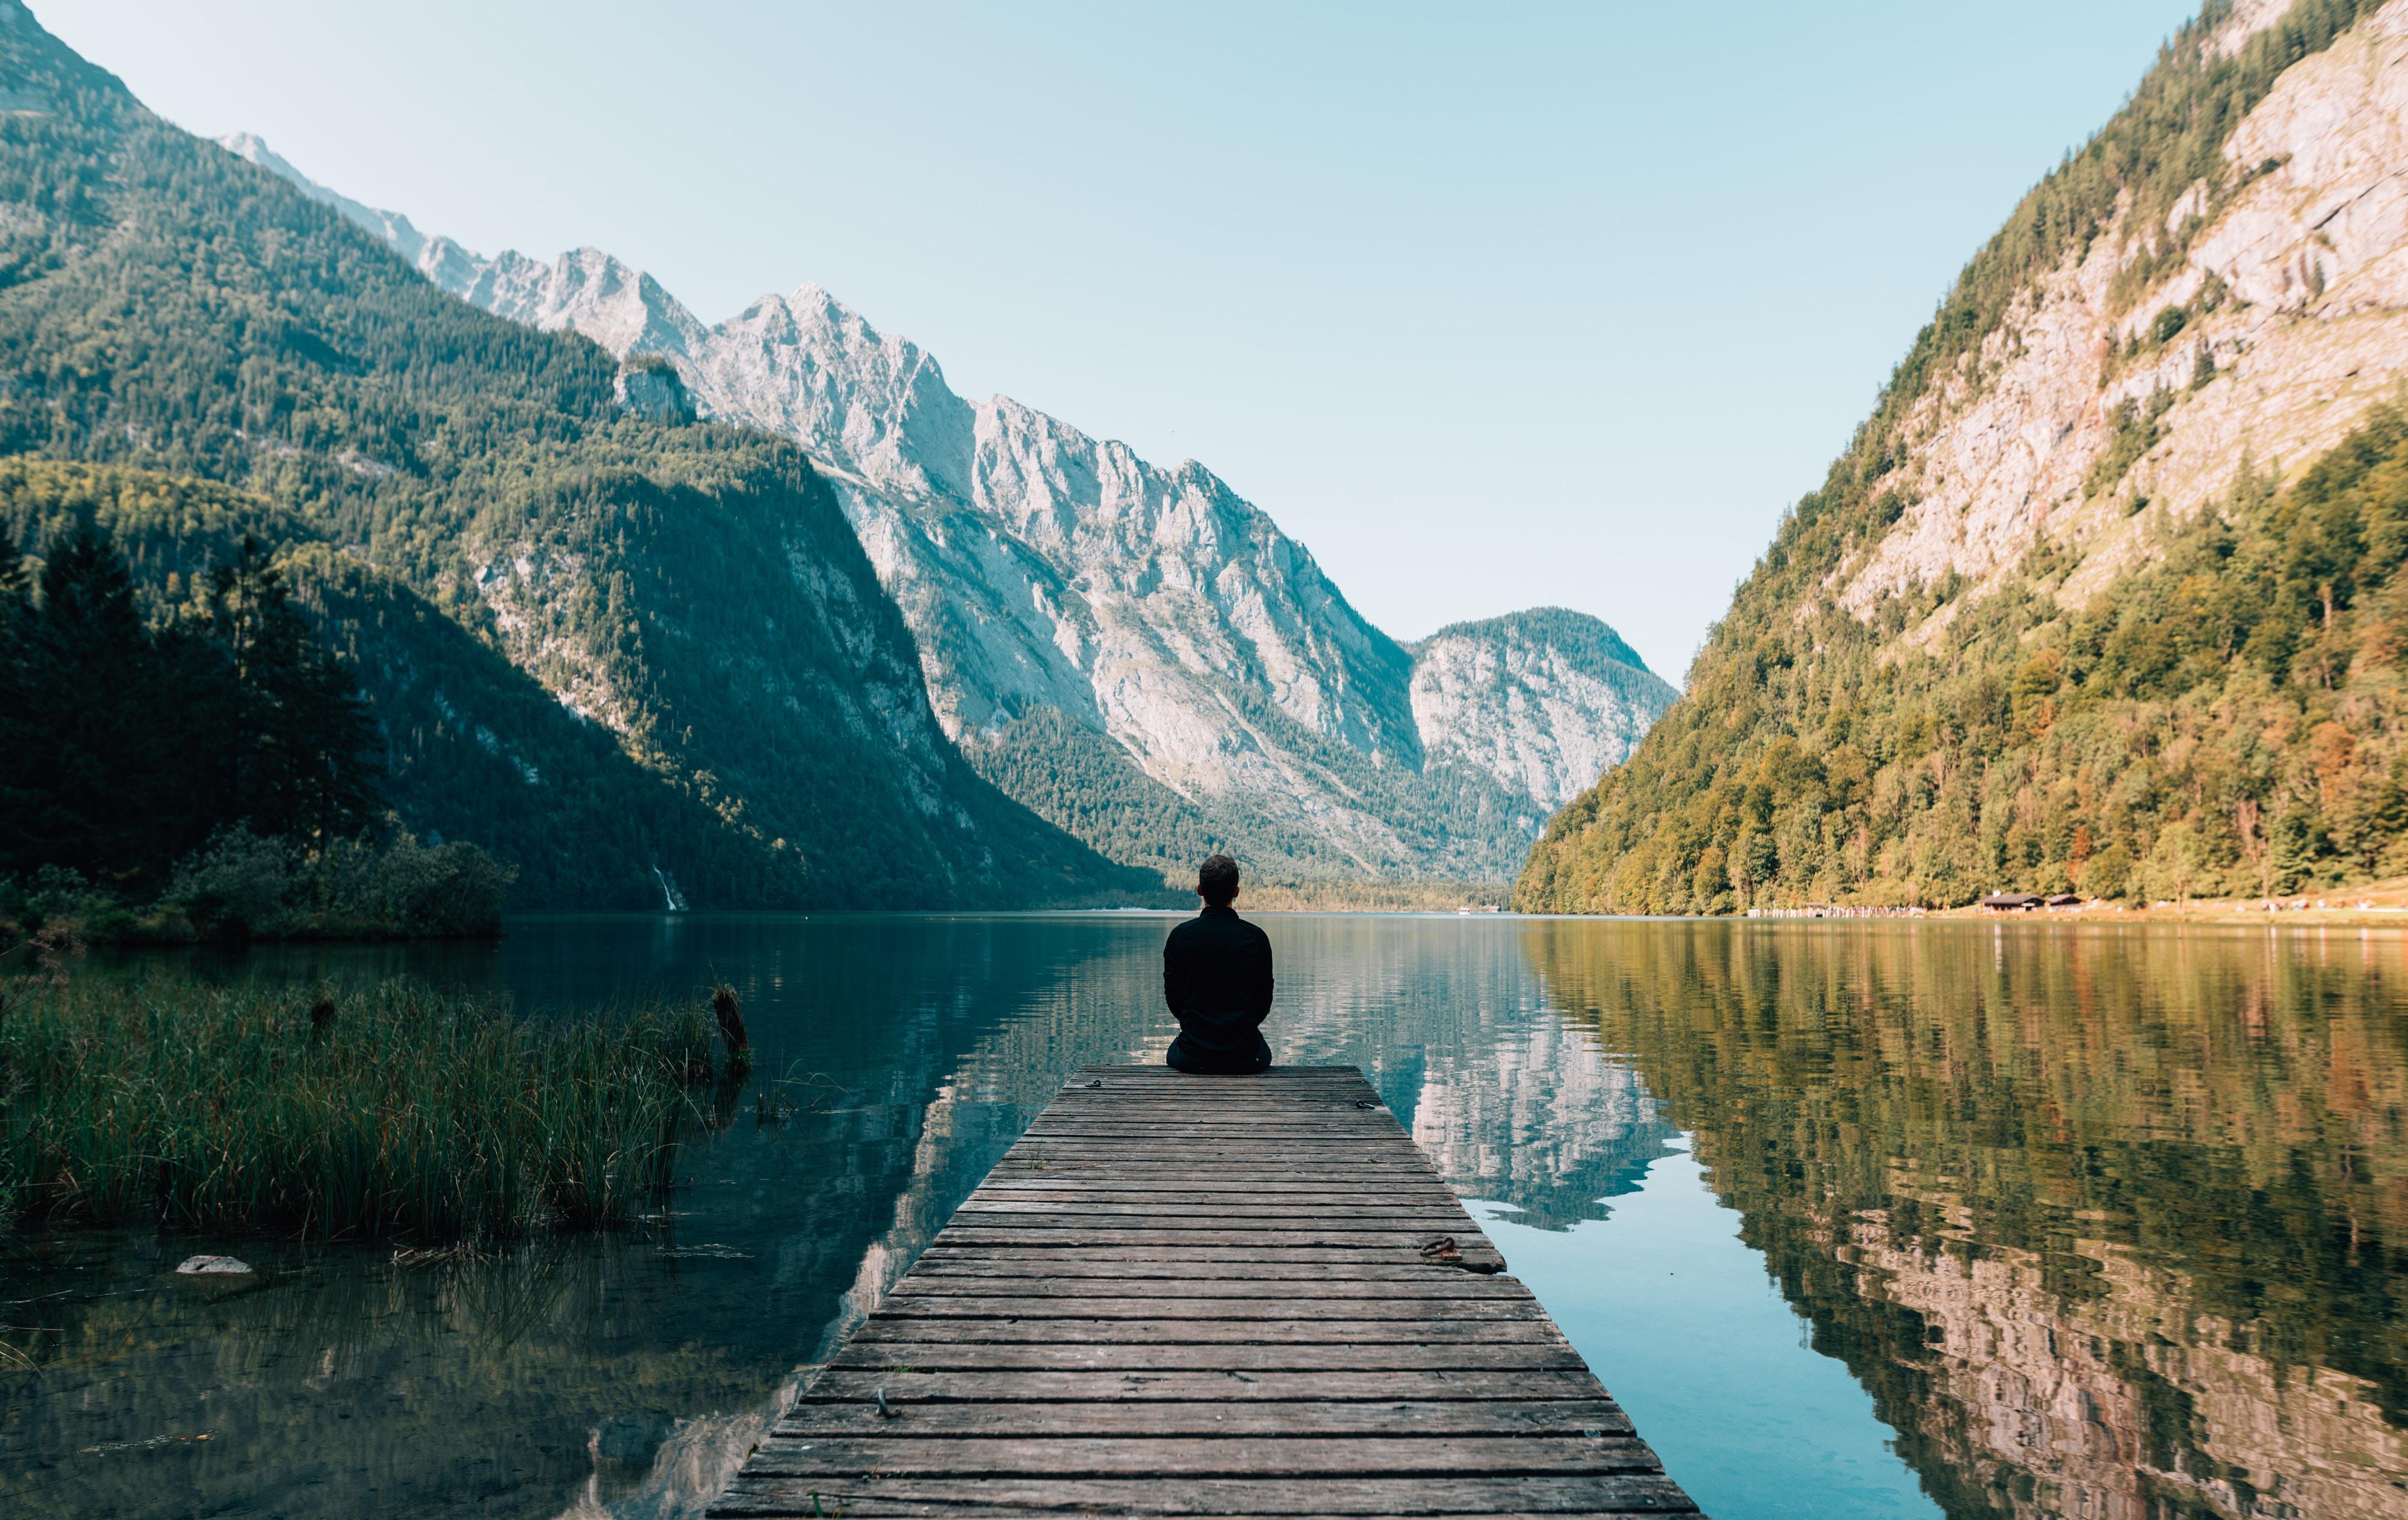 simon migaj 421505 unsplash - Gratitude Practice II